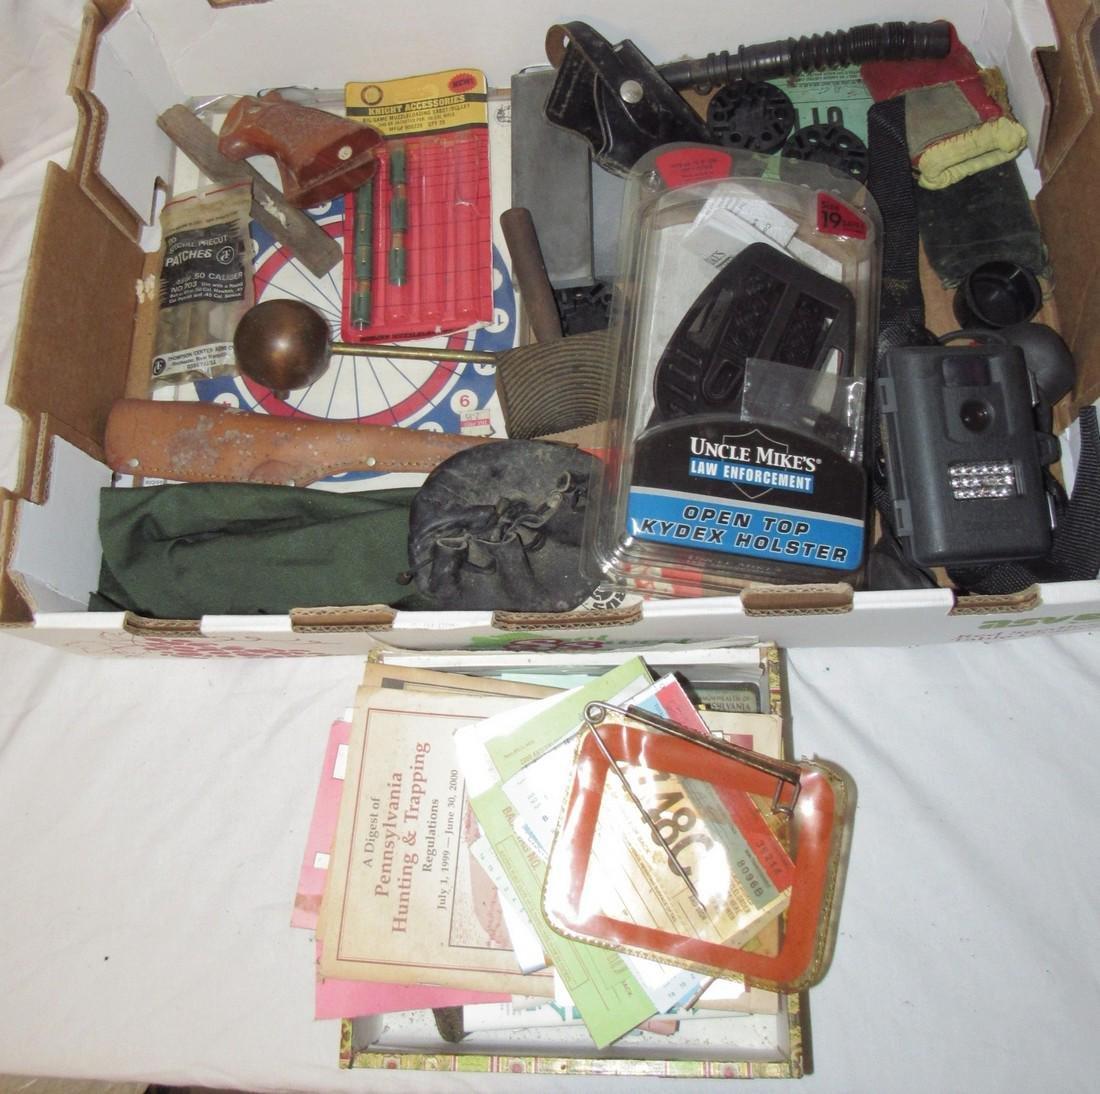 Pistol Grip Holsters Game Camera Muzzle Loader Sabots